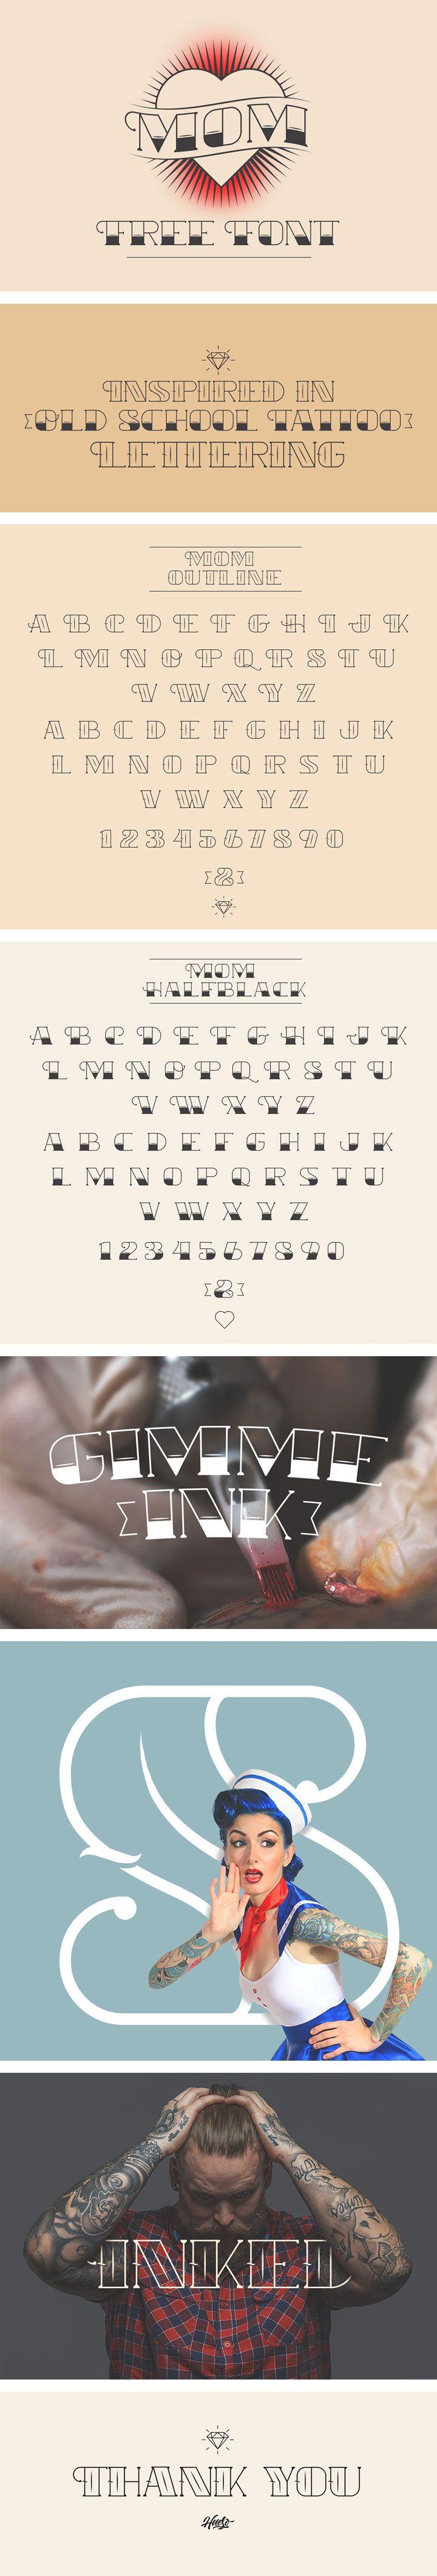 Collection of free Typefaces | Abduzeedo Design Inspiration